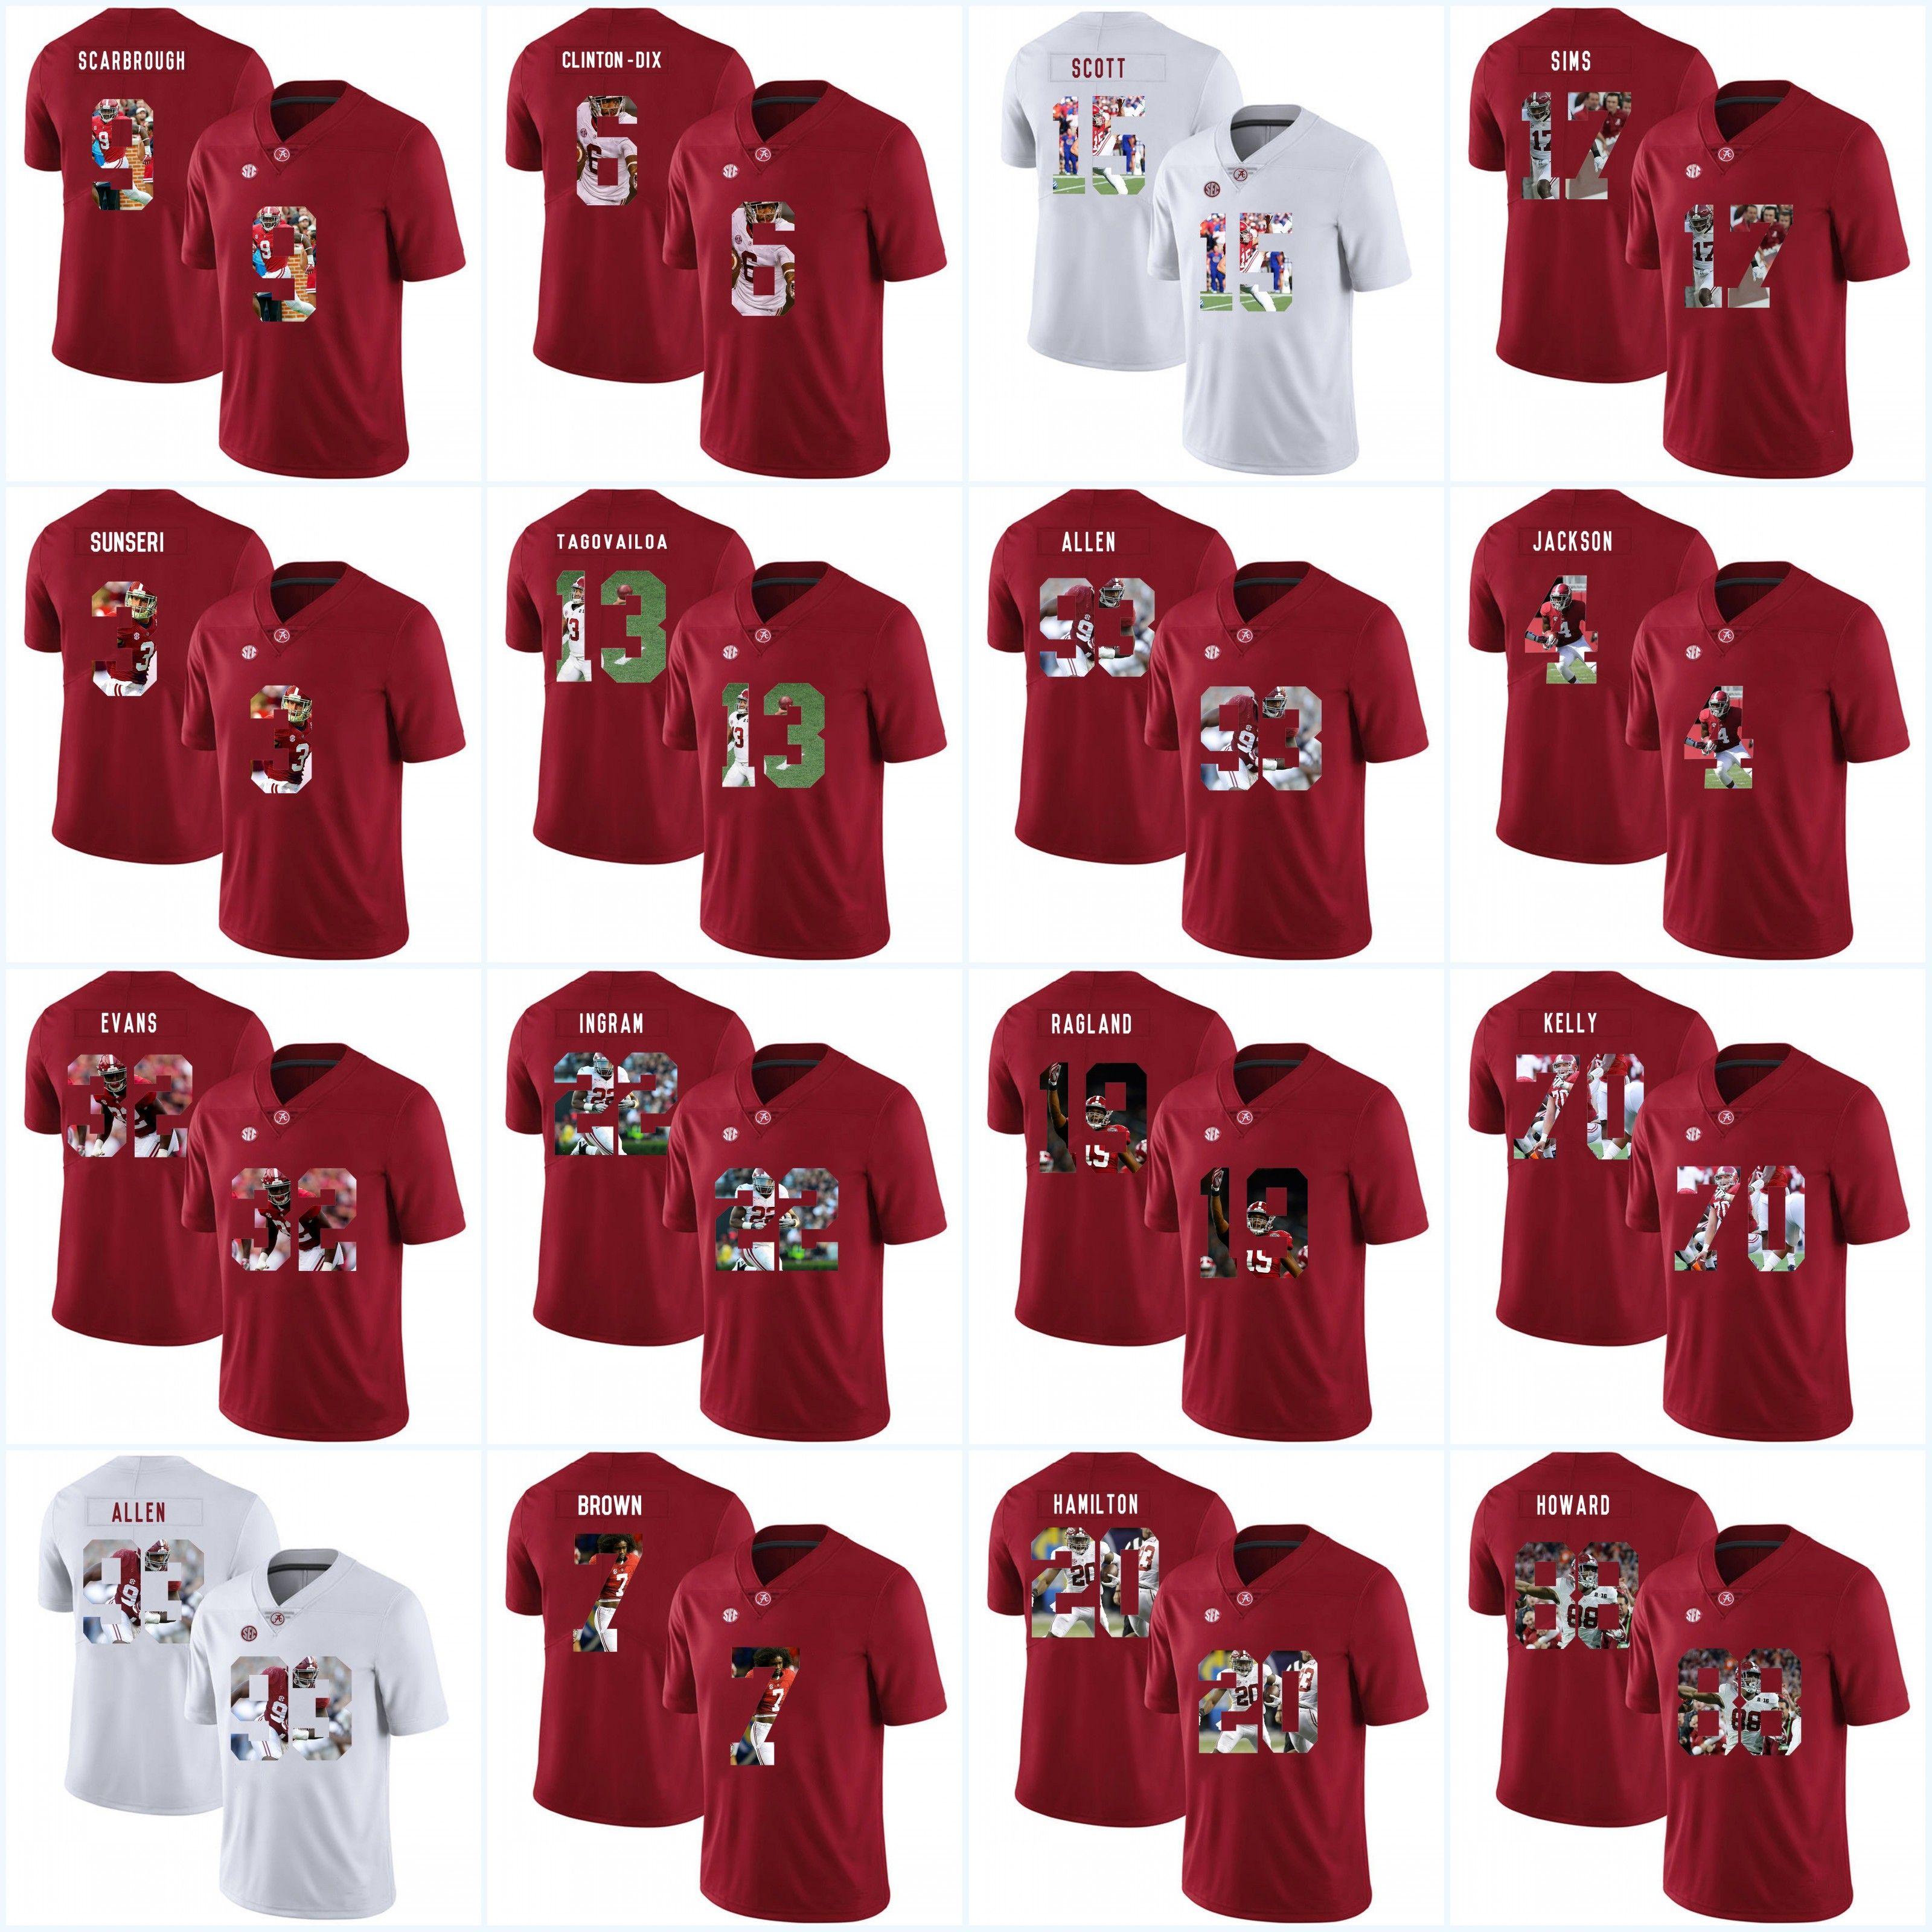 7f2d92f03 2019 Jonathan Allen Mens Alabama Crimson Tide NCAA Jersey 3 Vinnie Sunseri 13  Tua Tagovailoa 4 T.J. Yeldon 70 Ryan Kelly College Football Jerseys From ...